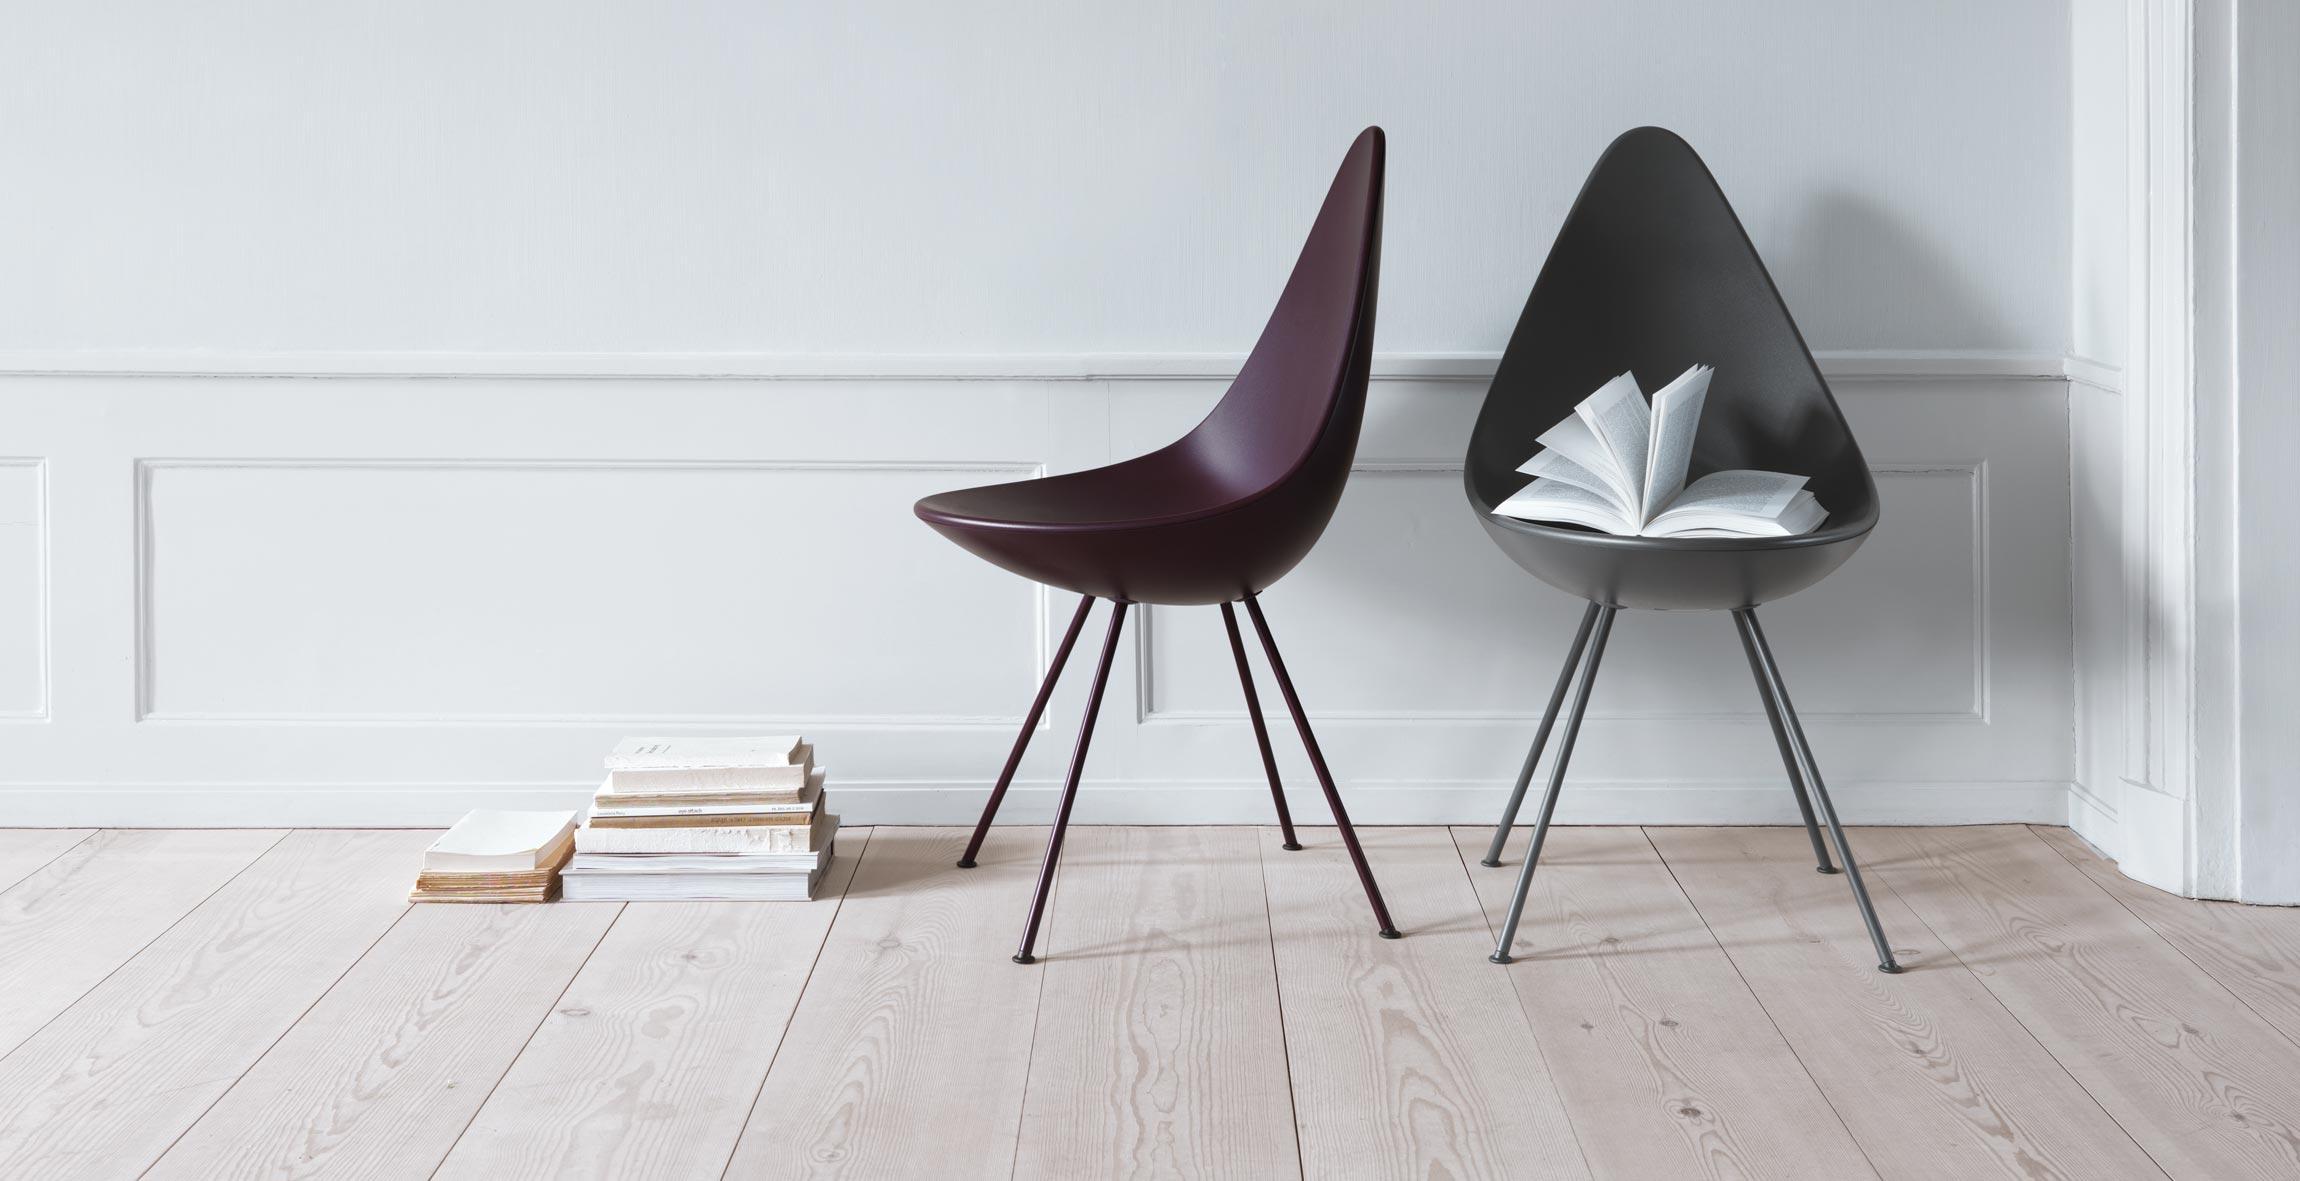 Fritz Hansen Drop Chairs Burgundy & Shadow Grey